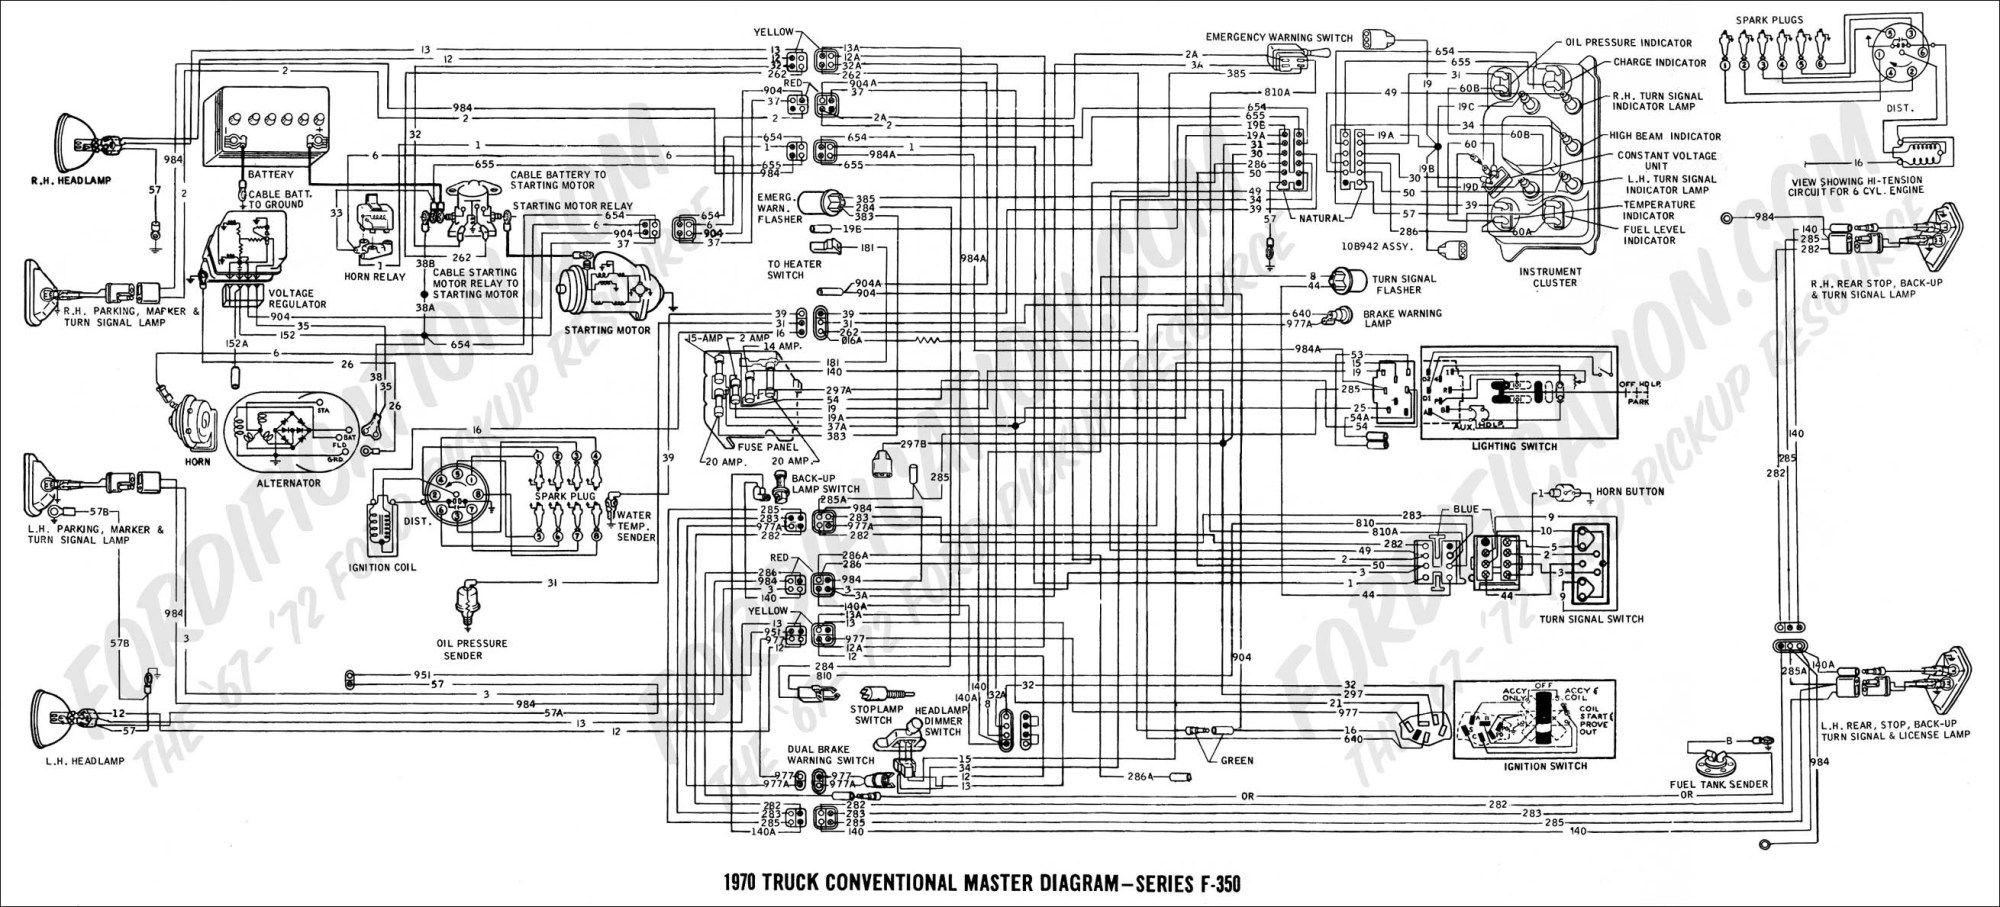 hight resolution of 70 bronco wiring diagram free image about wiring diagram rh wuzzie co 1995 saturn sl1 engine 2000 mitsubishi eclipse engine